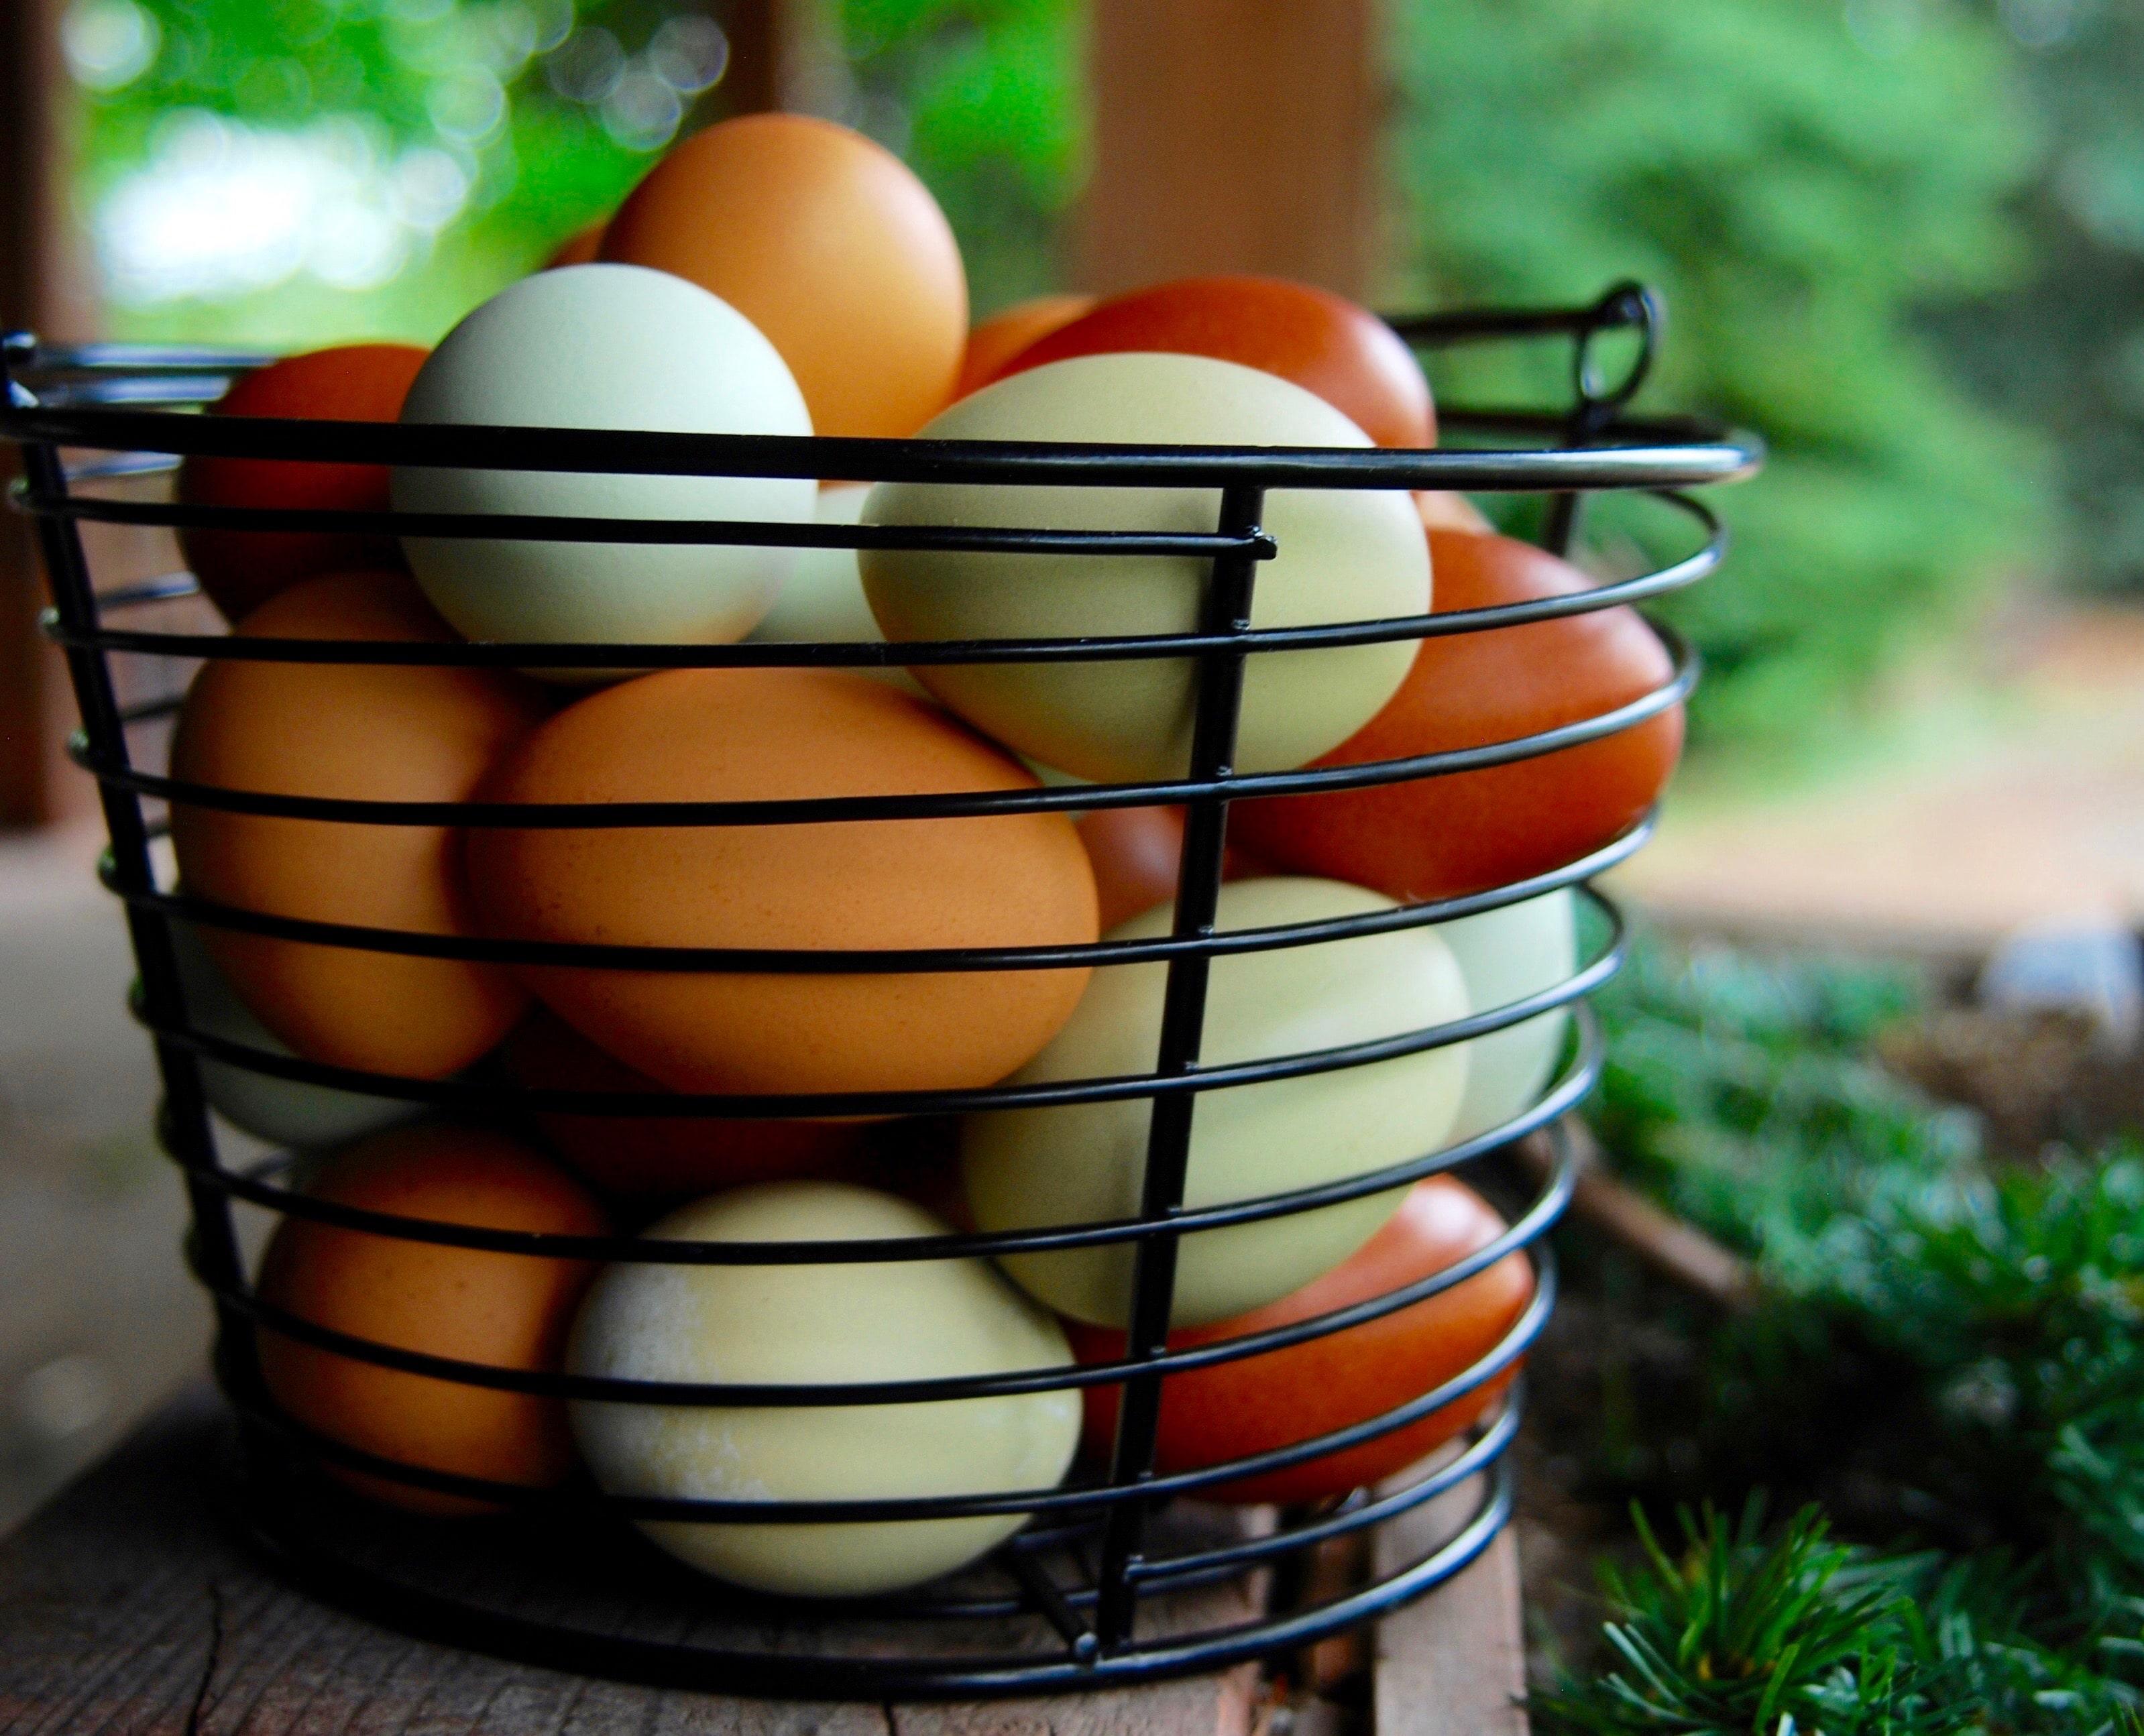 Feeding Eggshells to Chickens?!